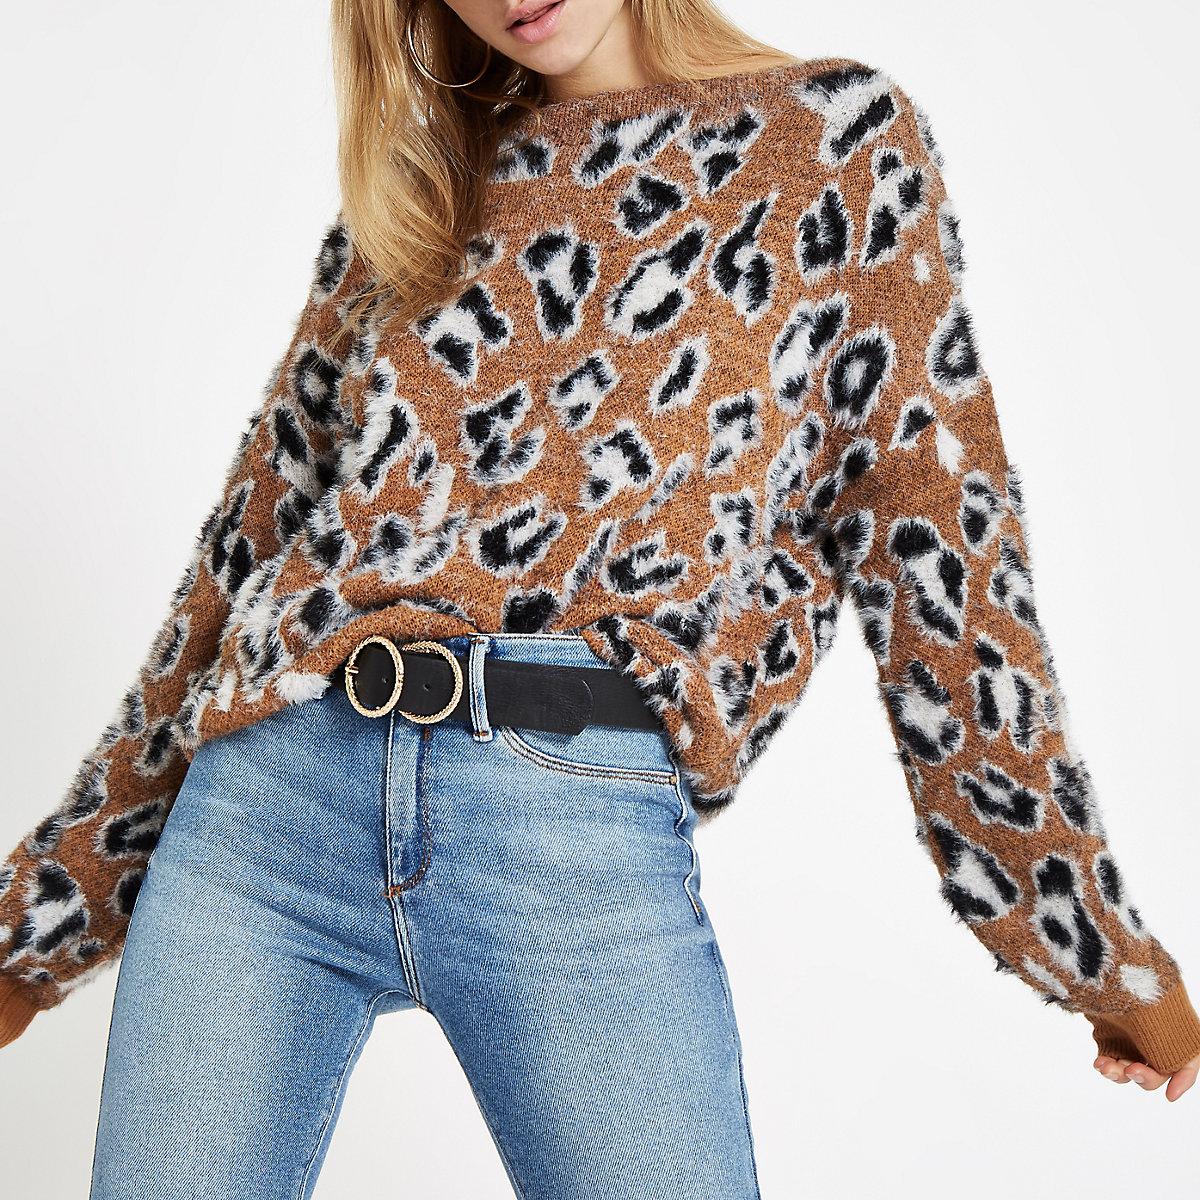 3cd0cb333258 Brauner Pullover mit Leopardenprint Brauner Pullover mit Leopardenprint ...